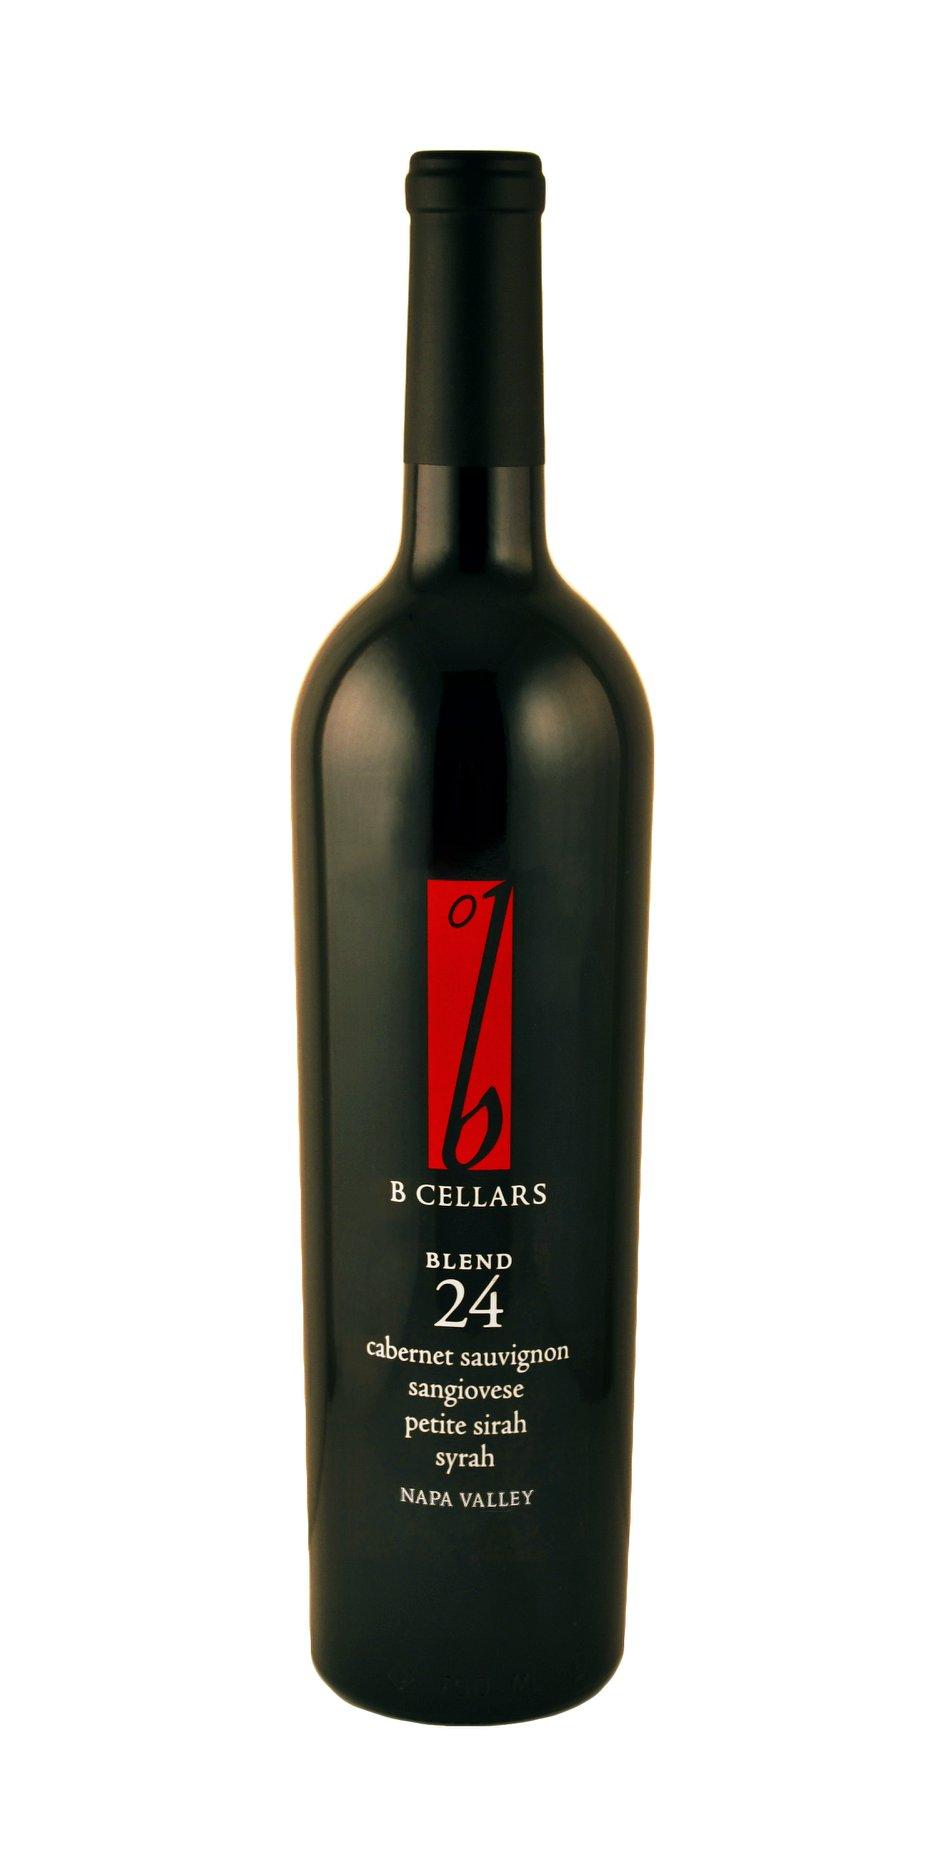 B cellars – Blend 24, 2015 – Napa Valley